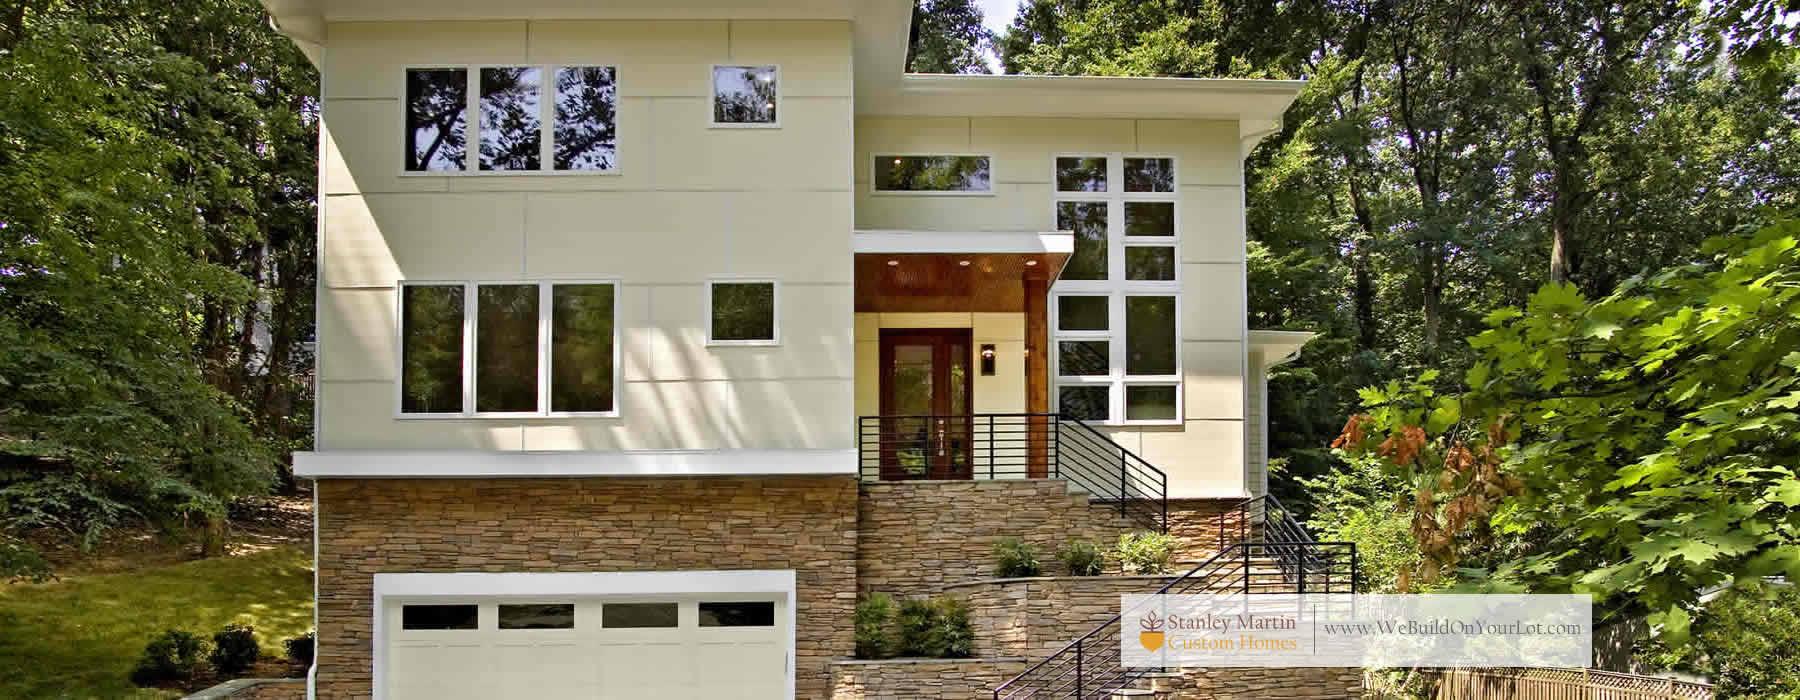 Stanley-Martin-Custom-Homes-Brooklyn-Model-Exterior-opt-slide